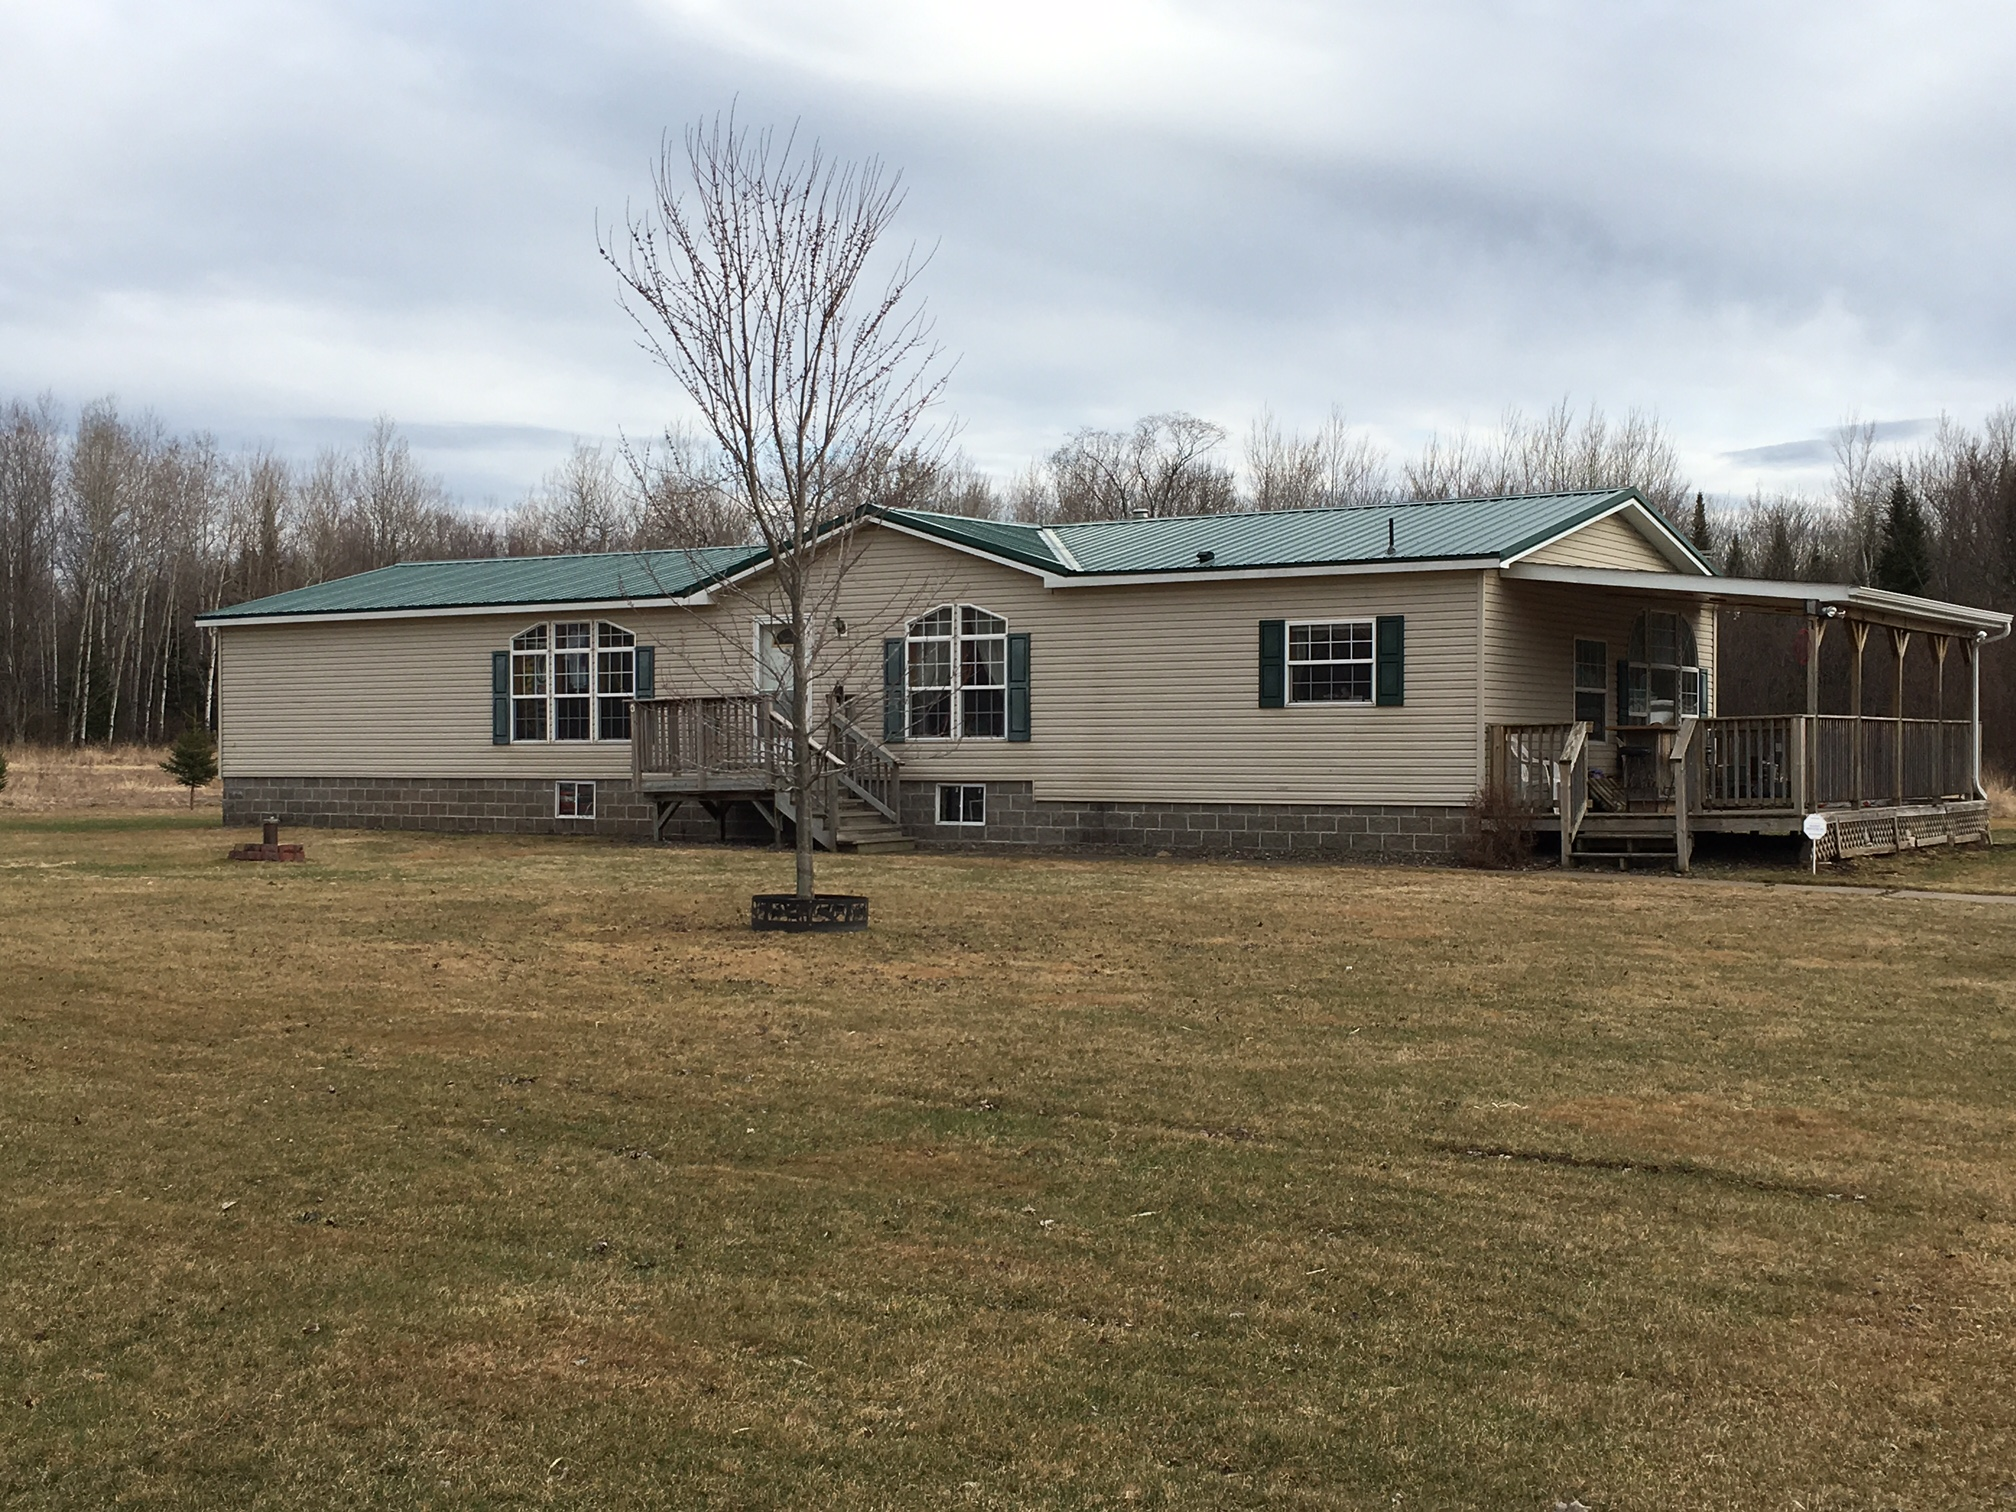 House For Sale South Range Wi Kevin Brisky Lakewoods Real Estate